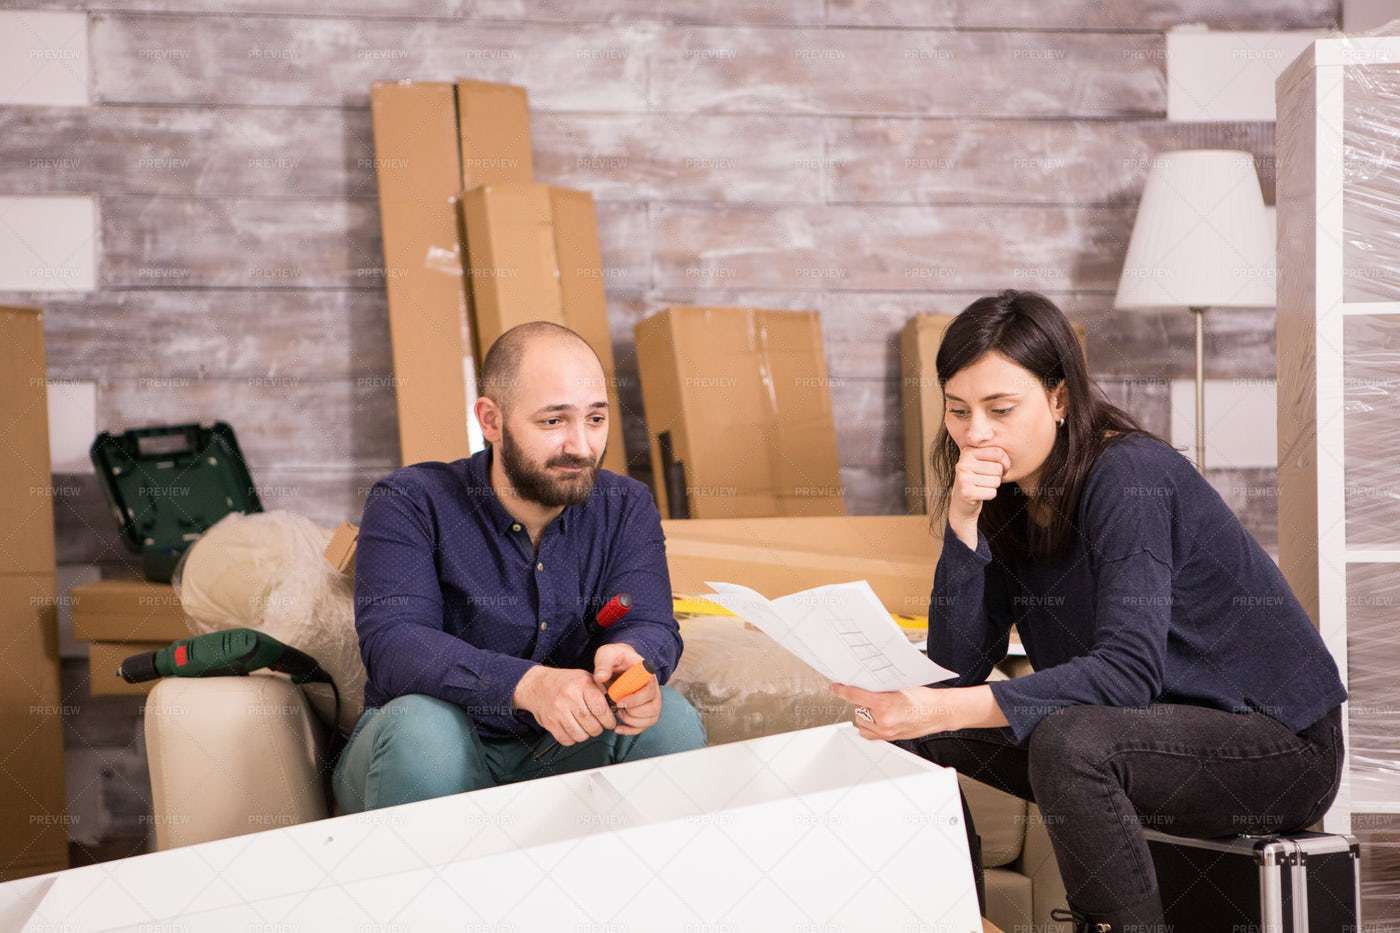 Hopeless Couple Assembling Furniture: Stock Photos